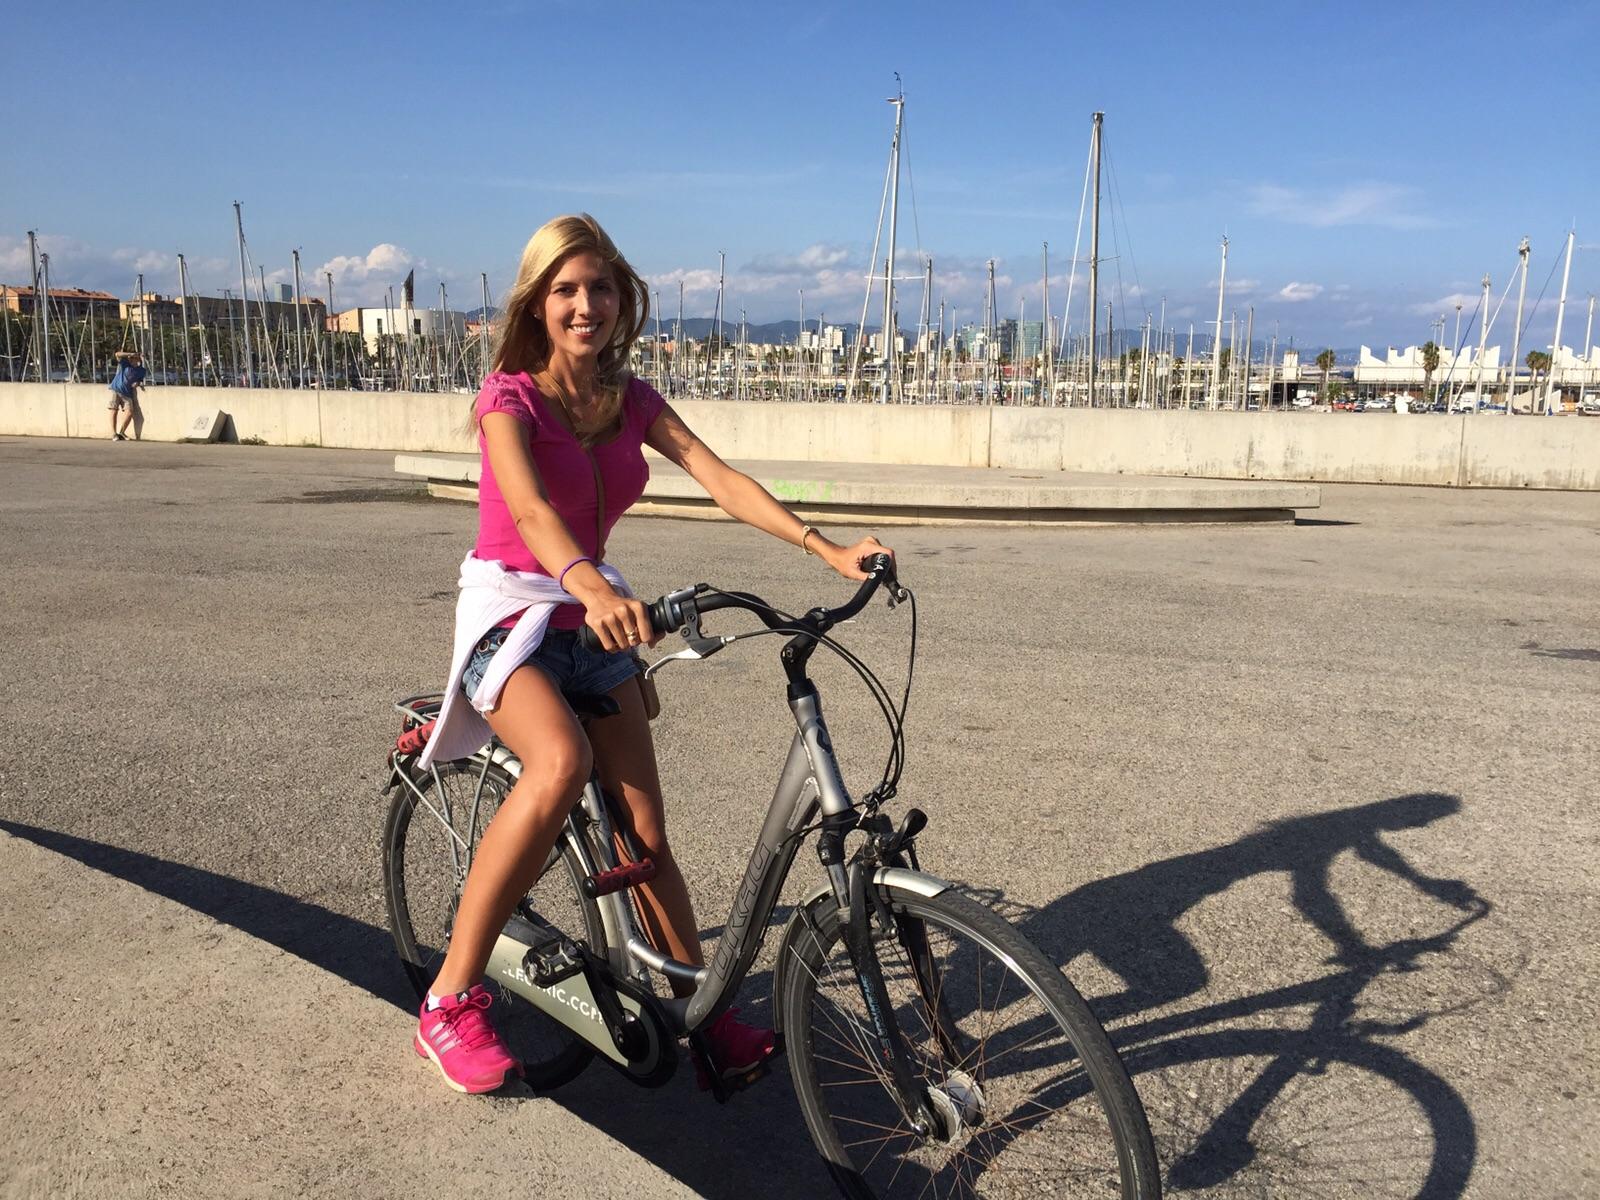 Time to relax biking down the beach